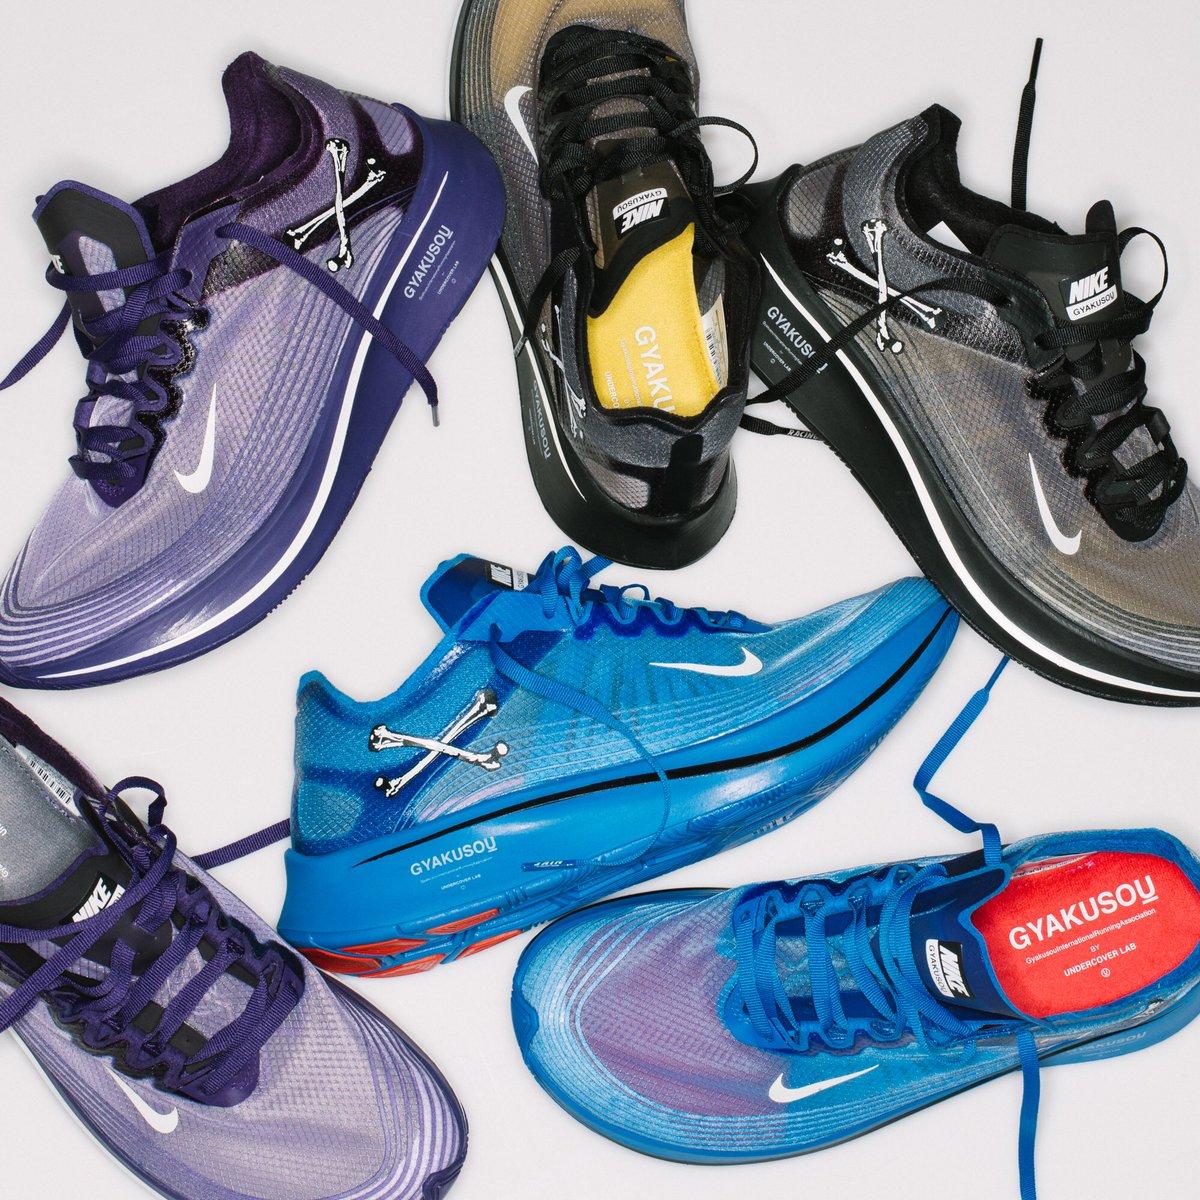 Piquete vóleibol tubo  zoom fly gyakusou Shop Clothing & Shoes Online